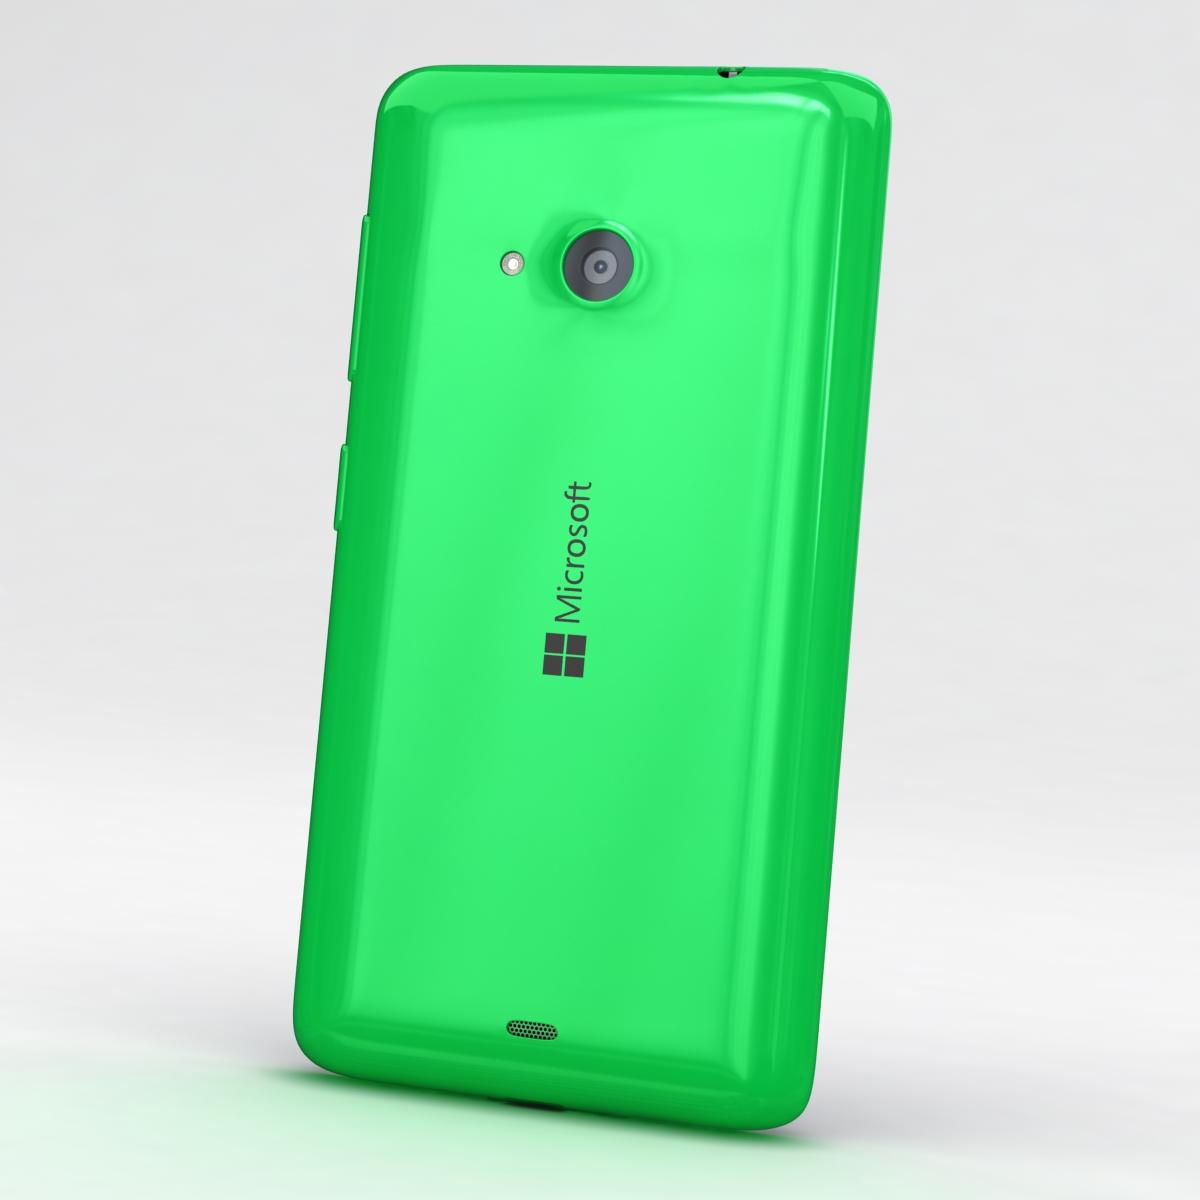 microsoft lumia 535 and dual sim green 3d model 3ds max fbx c4d obj 204168